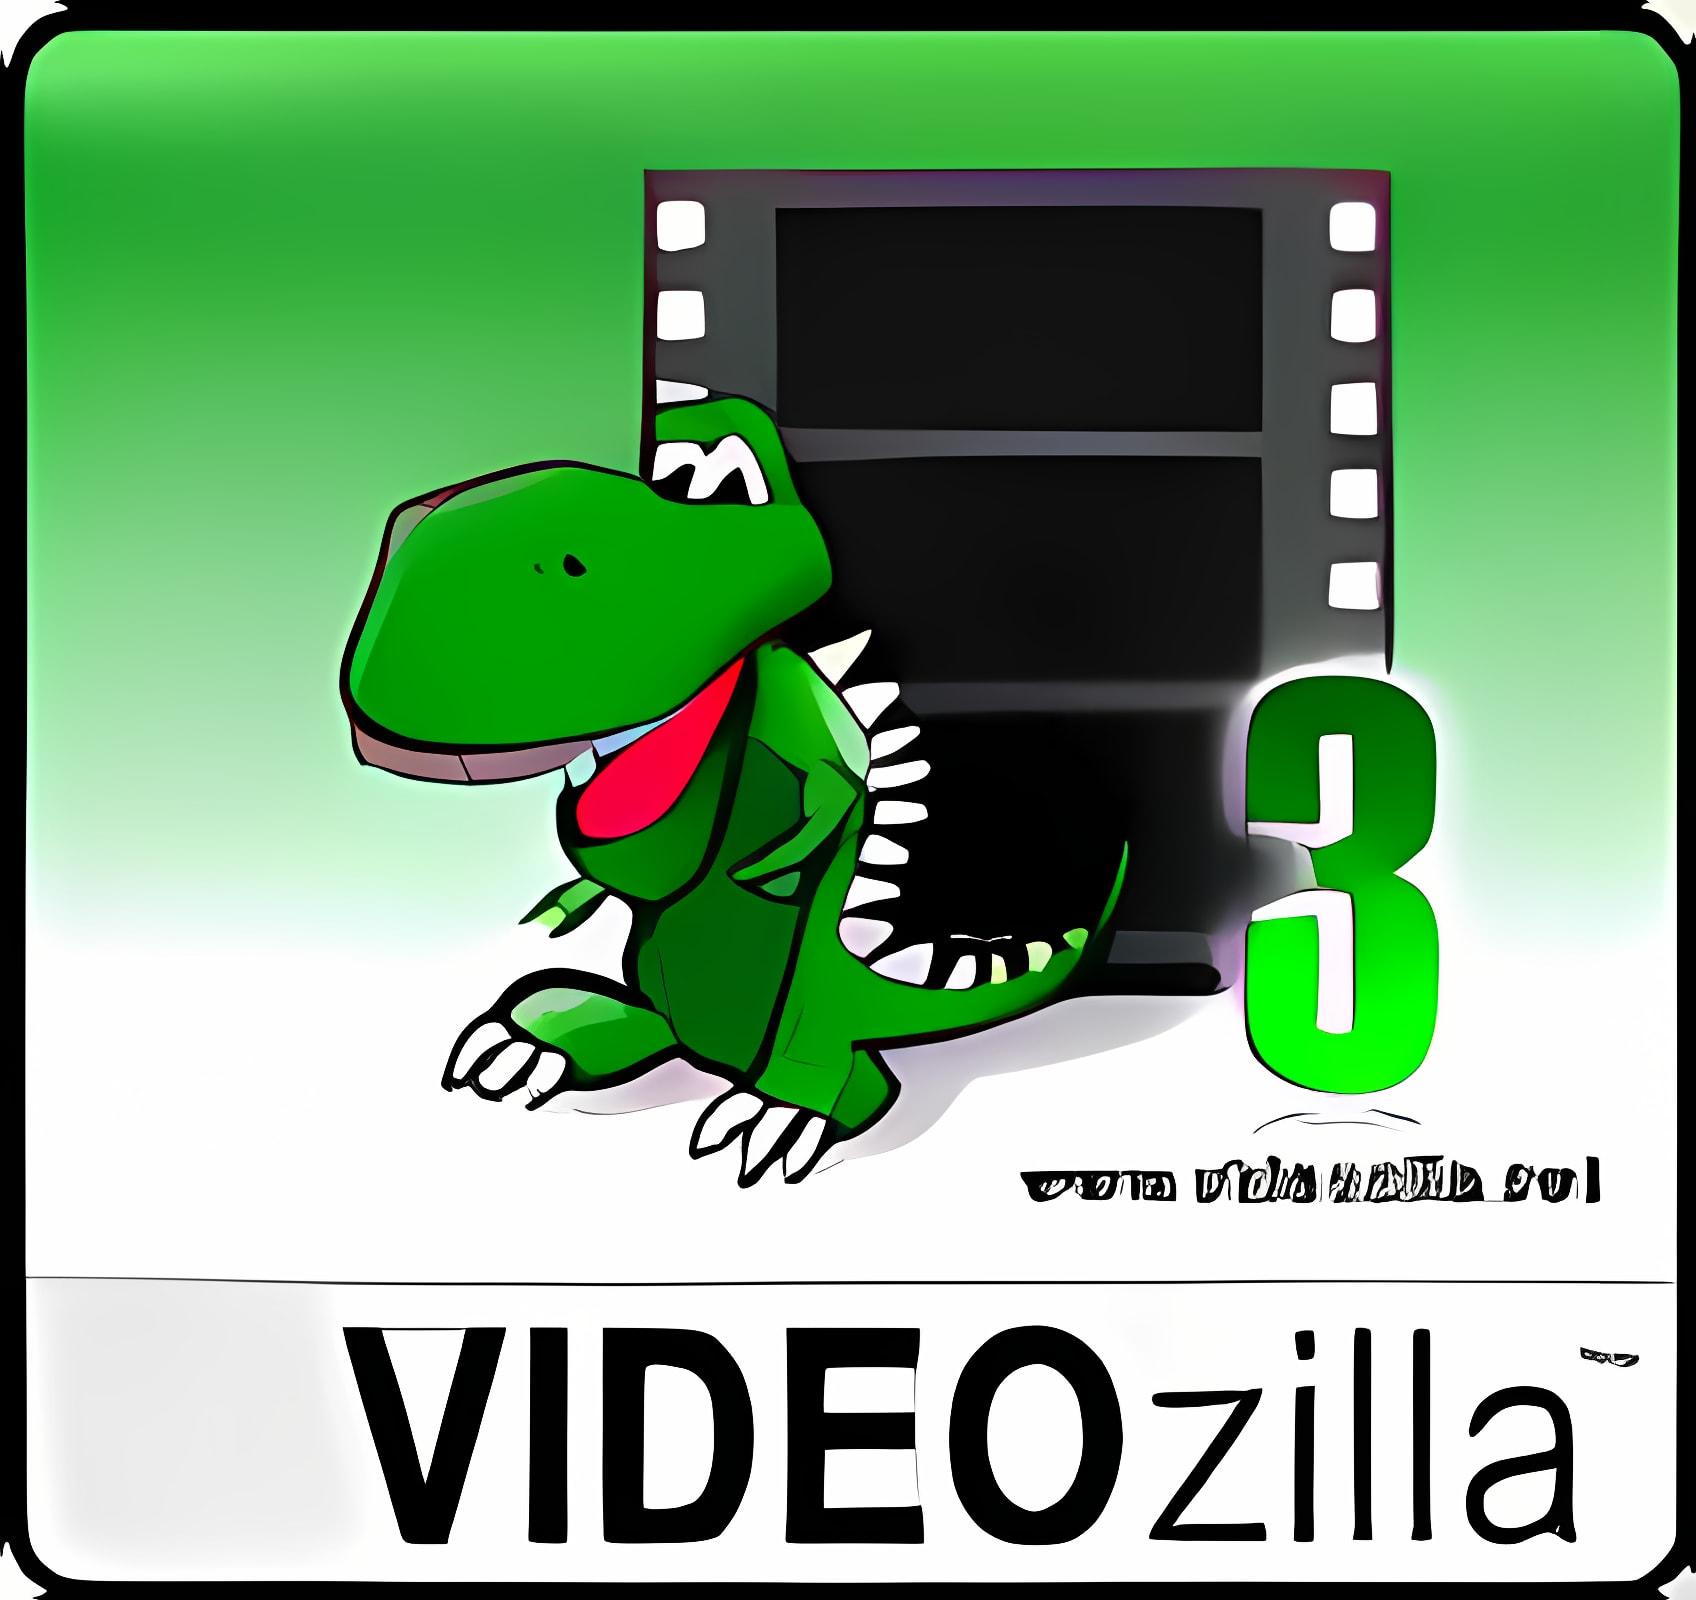 Videozilla